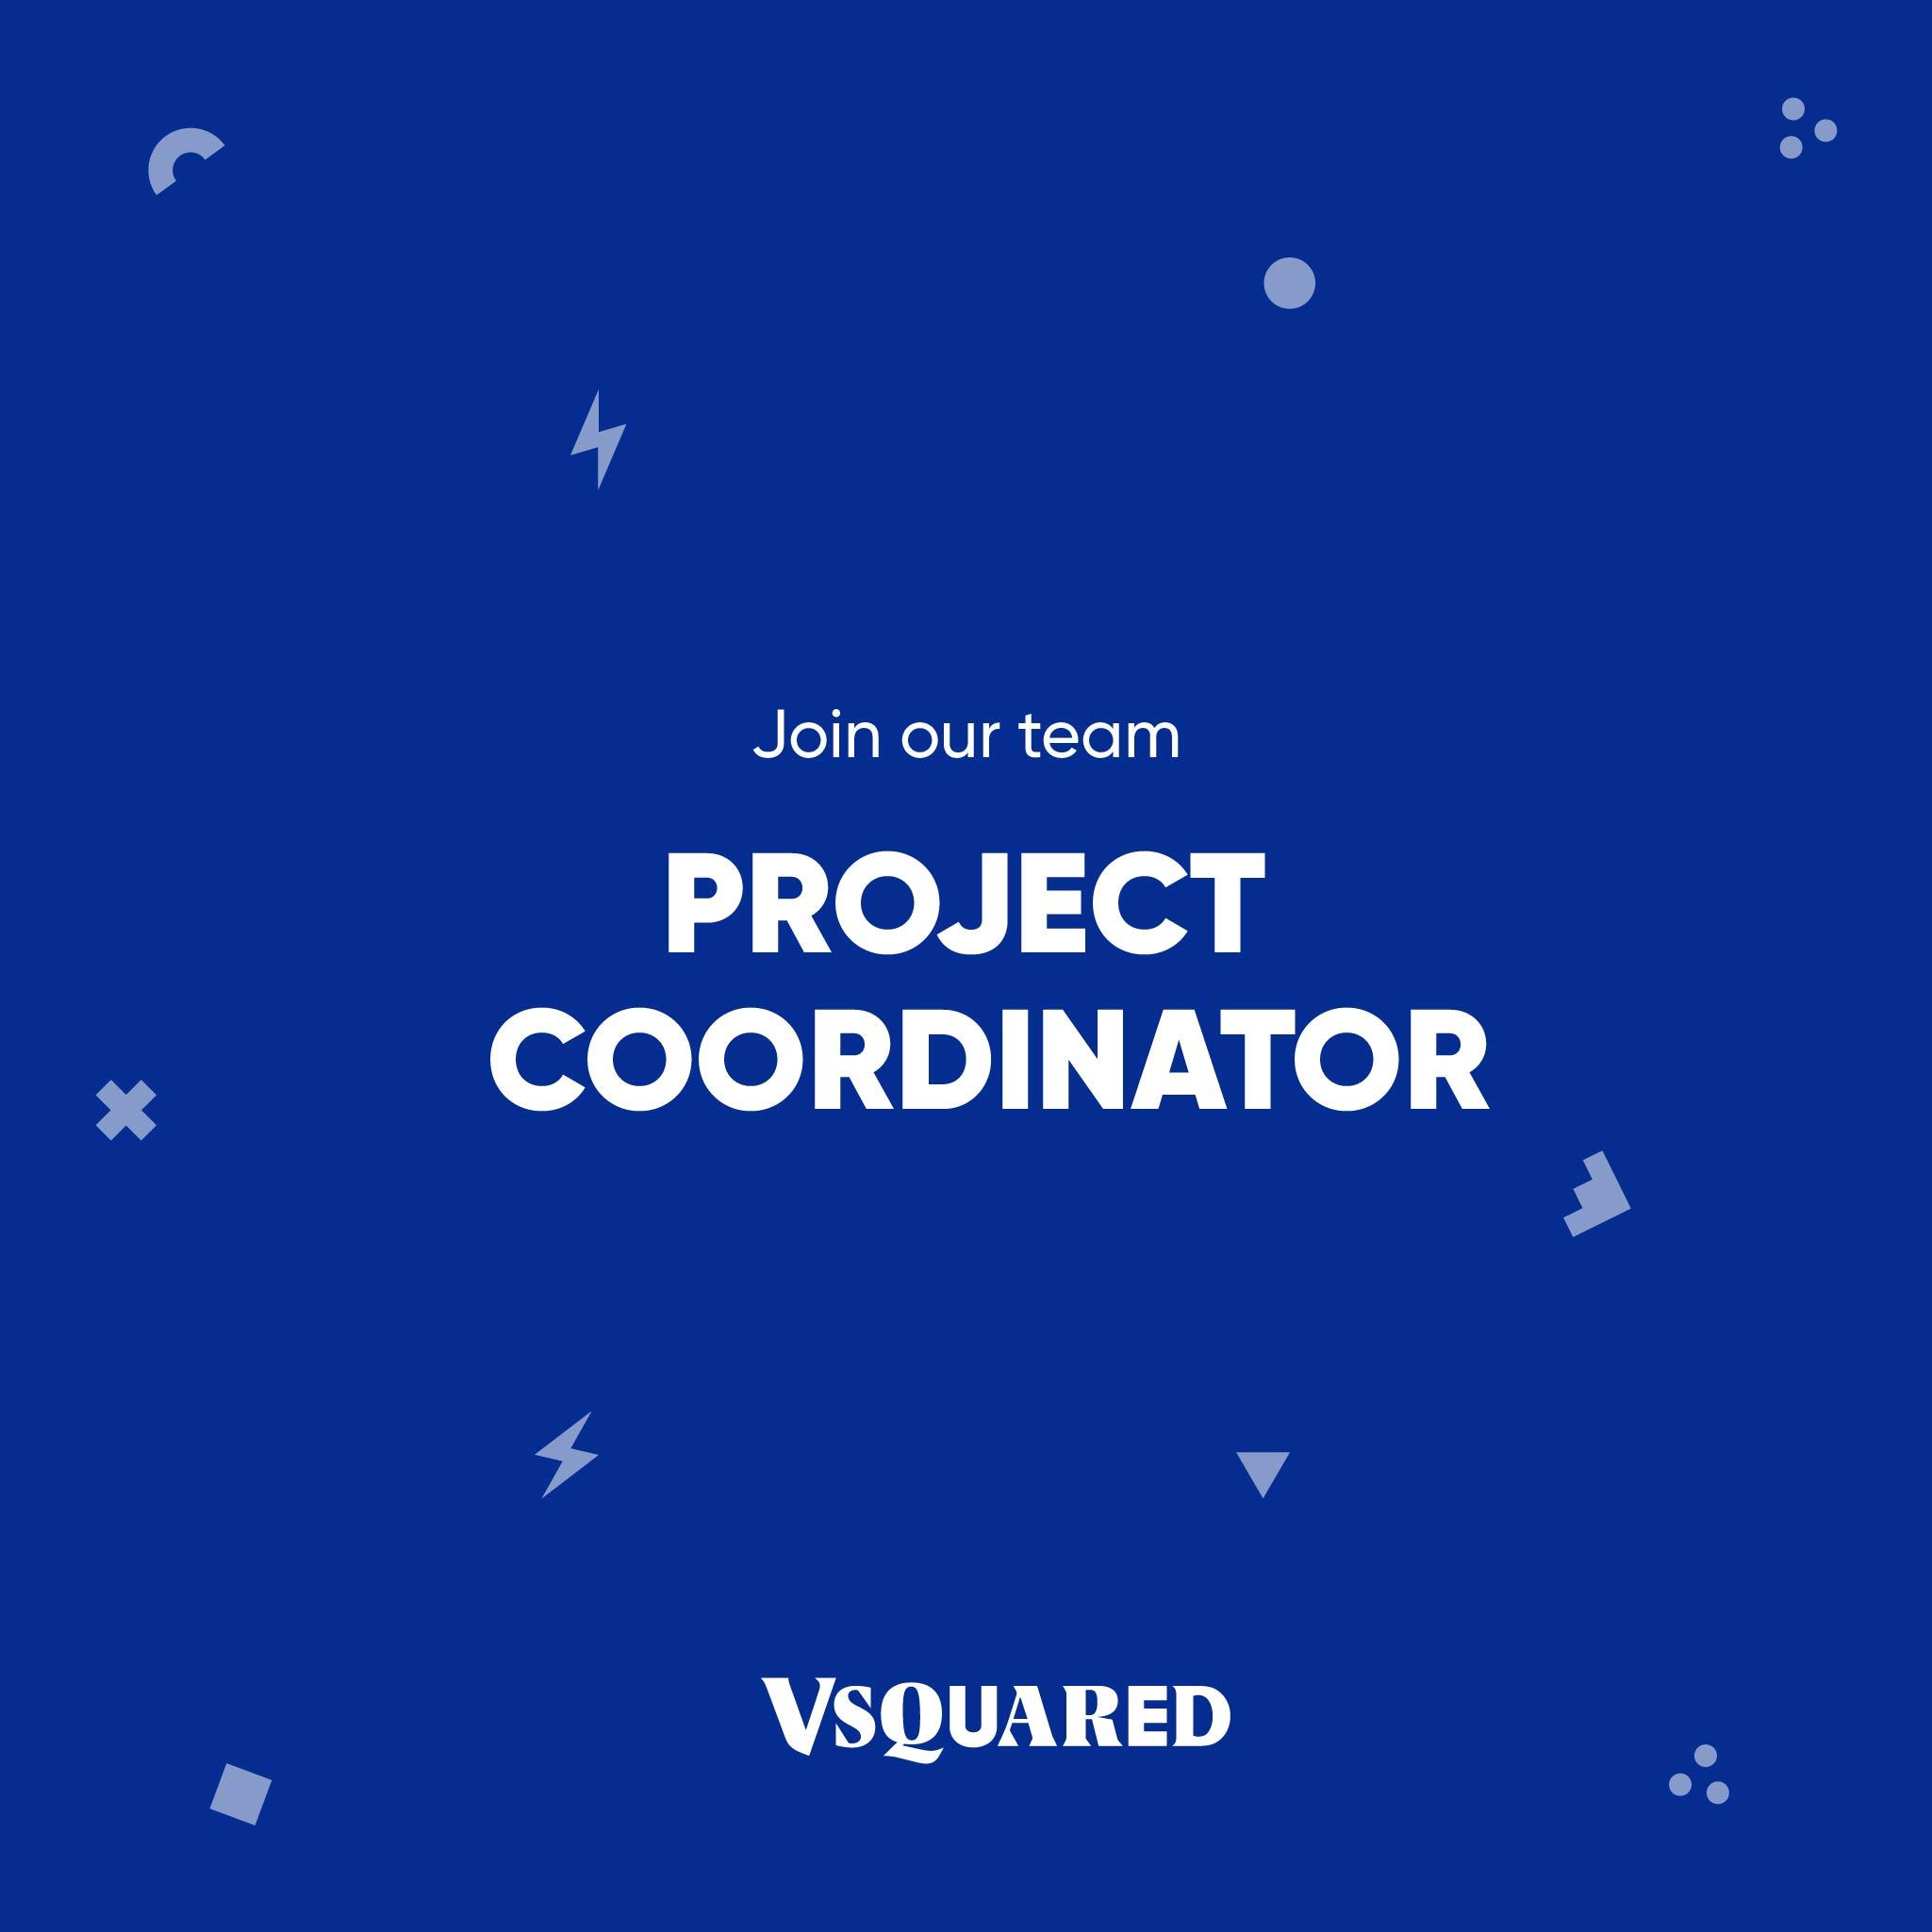 VSQUARED Project Coordinator